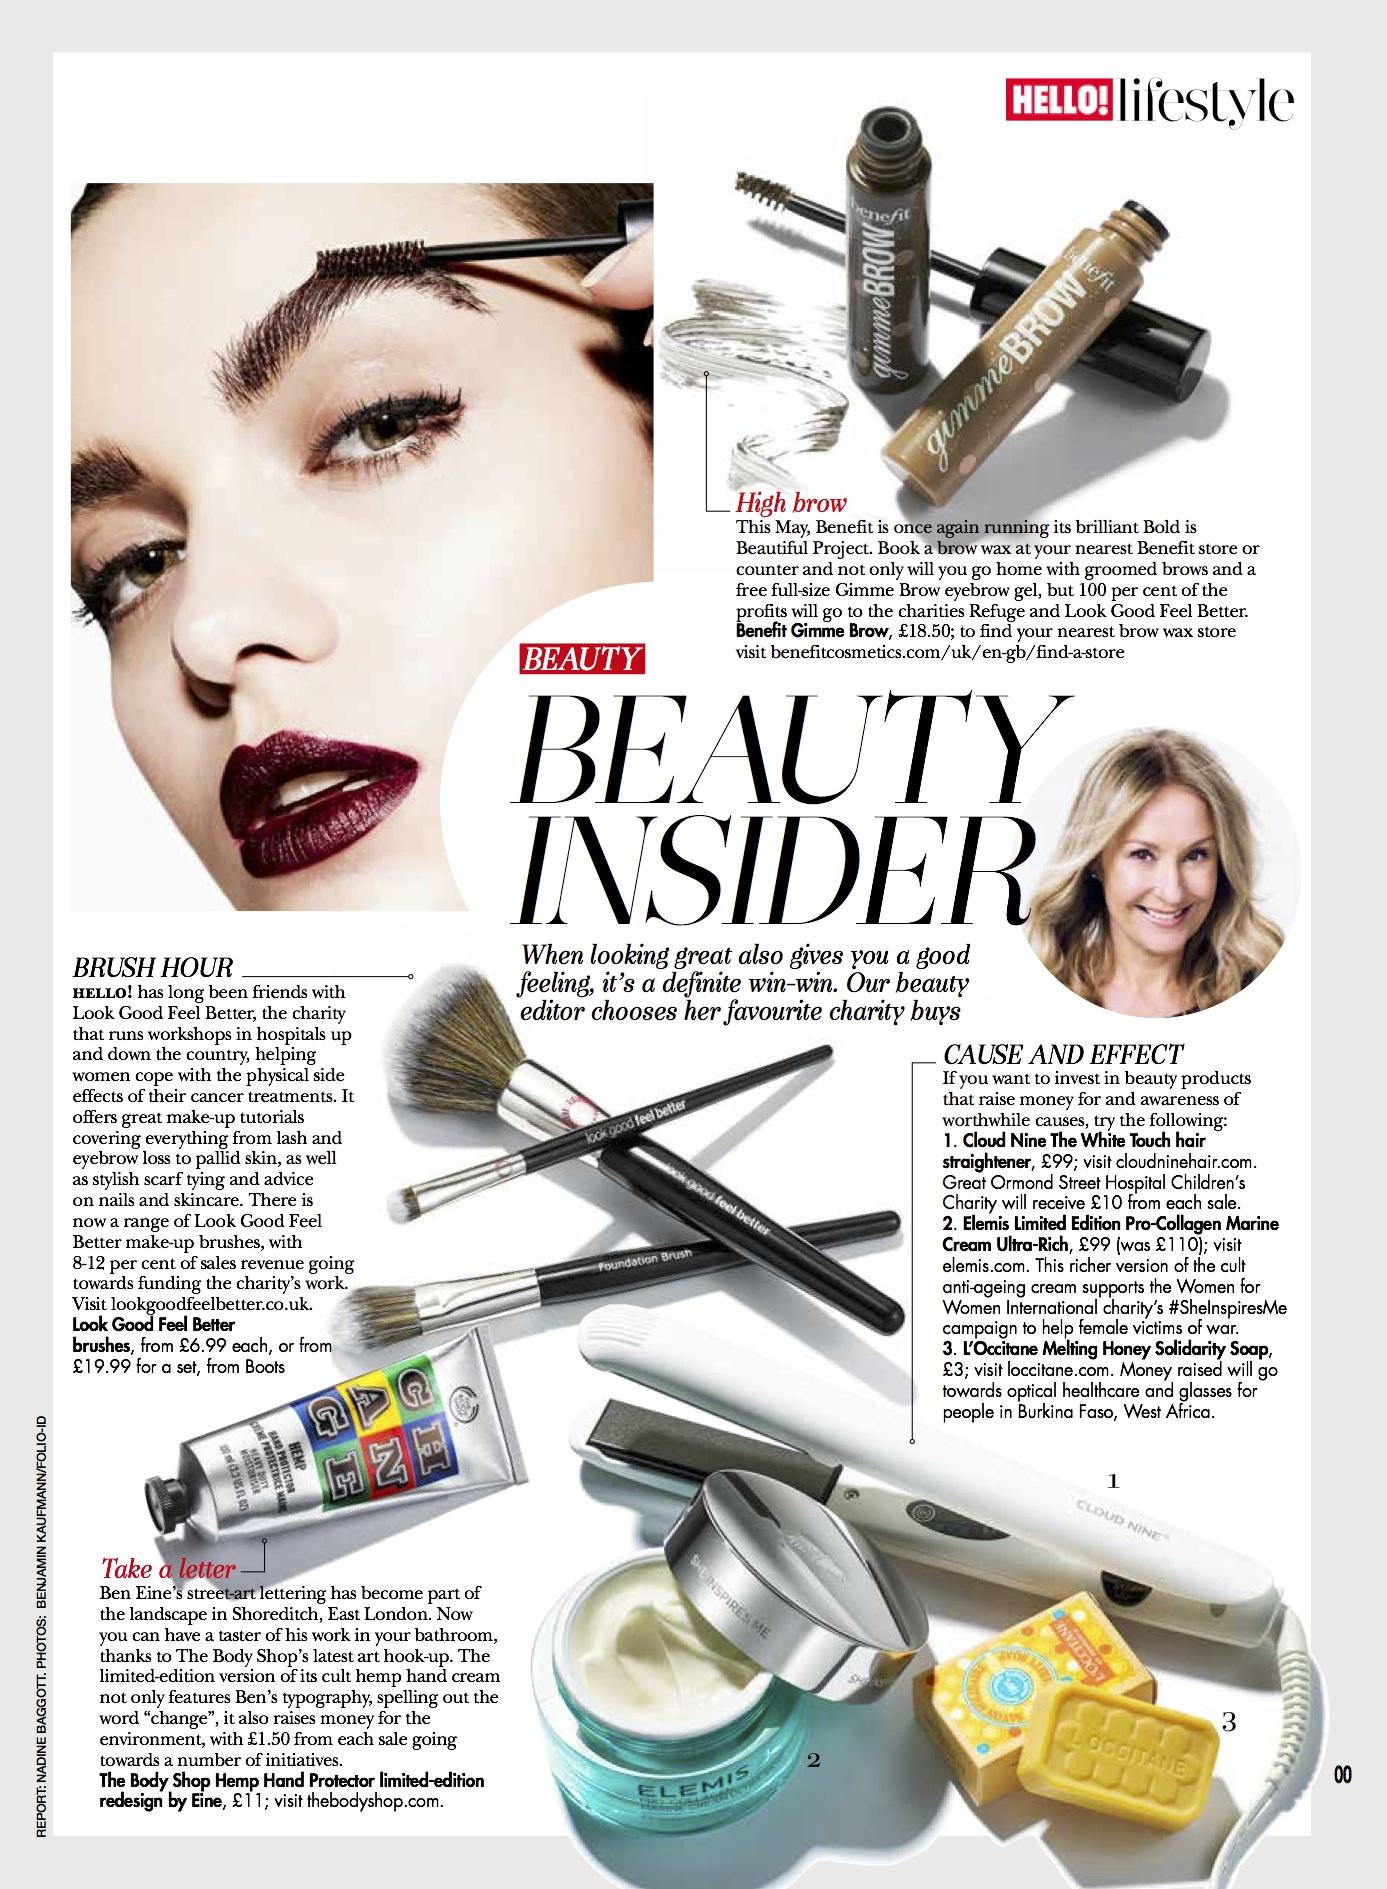 Beauty Insider charity.jpg